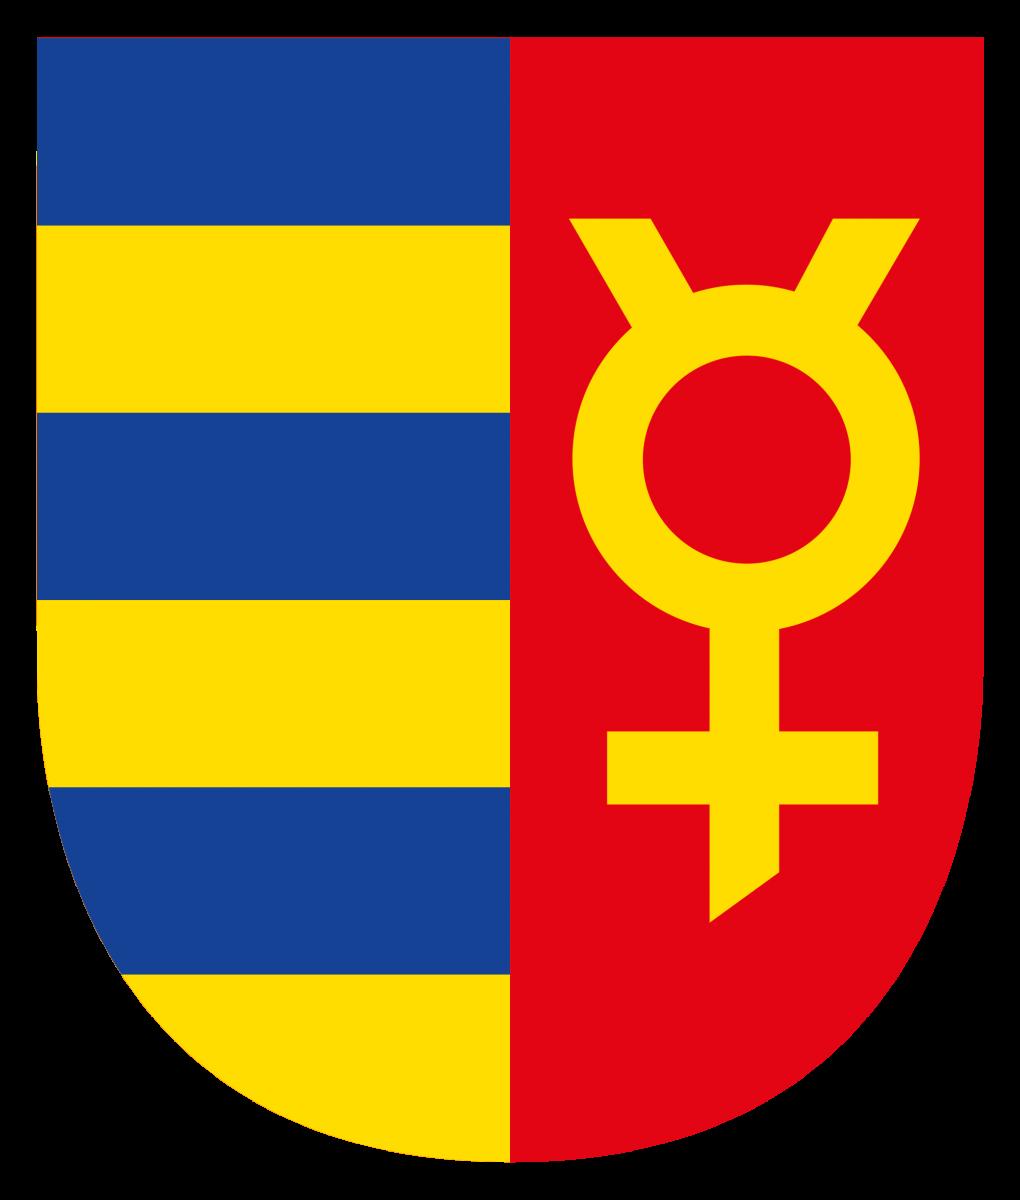 dunajska-streda-erb_0.png